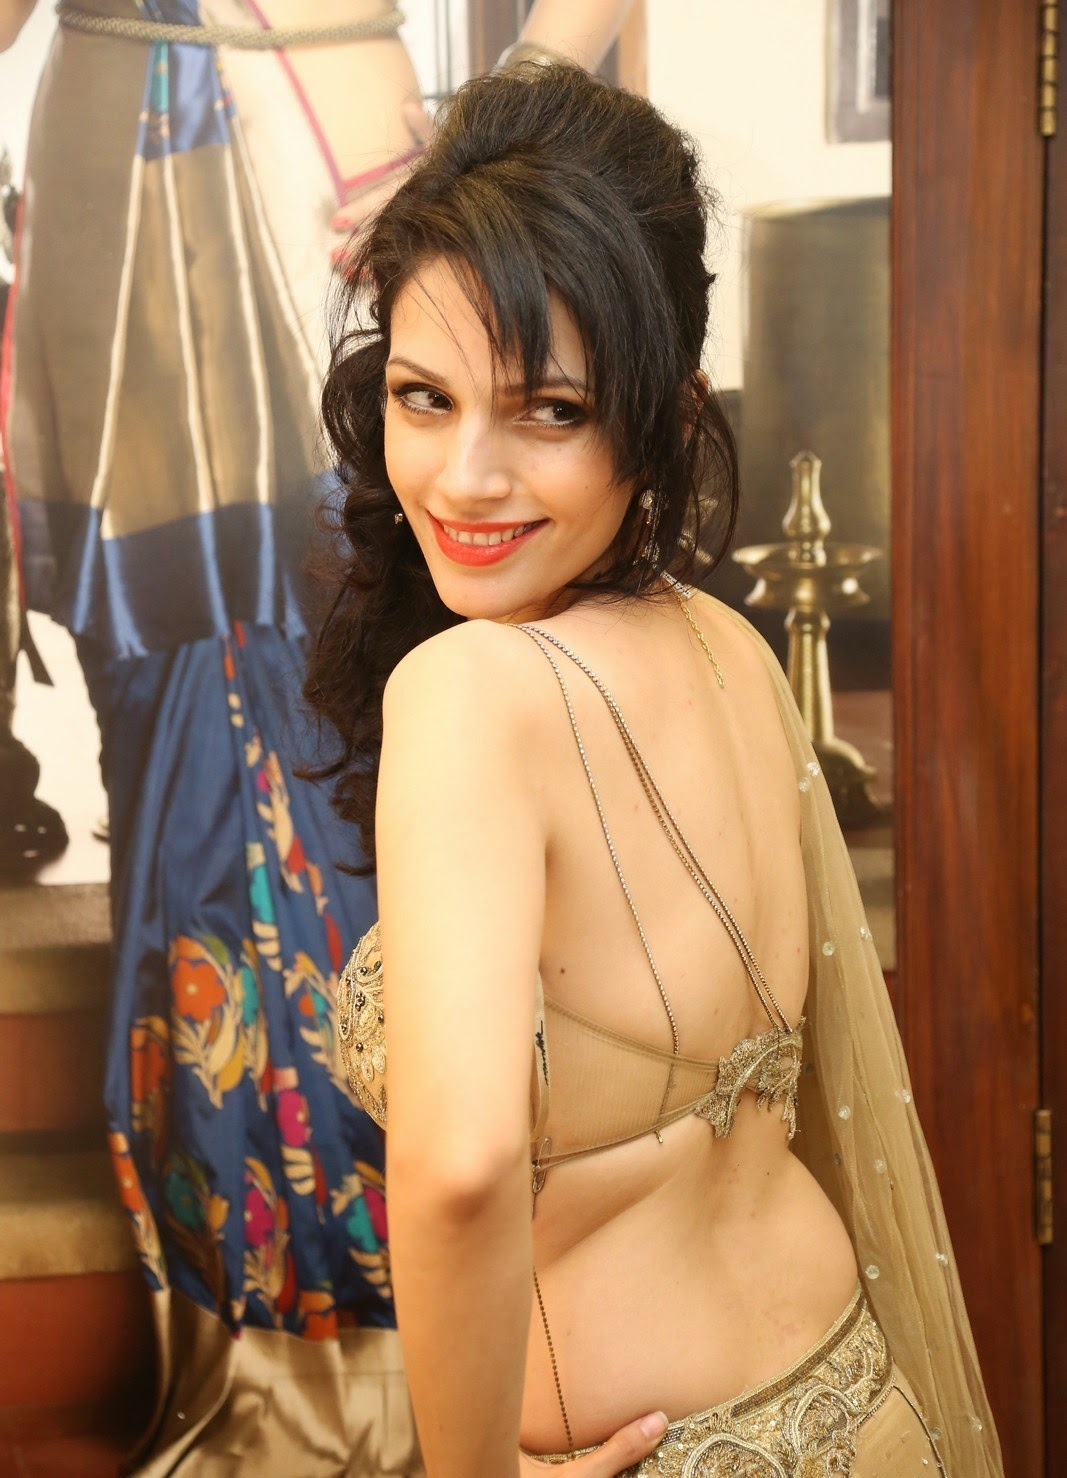 Cleavage Clara Bindi nudes (58 fotos) Feet, Twitter, cameltoe